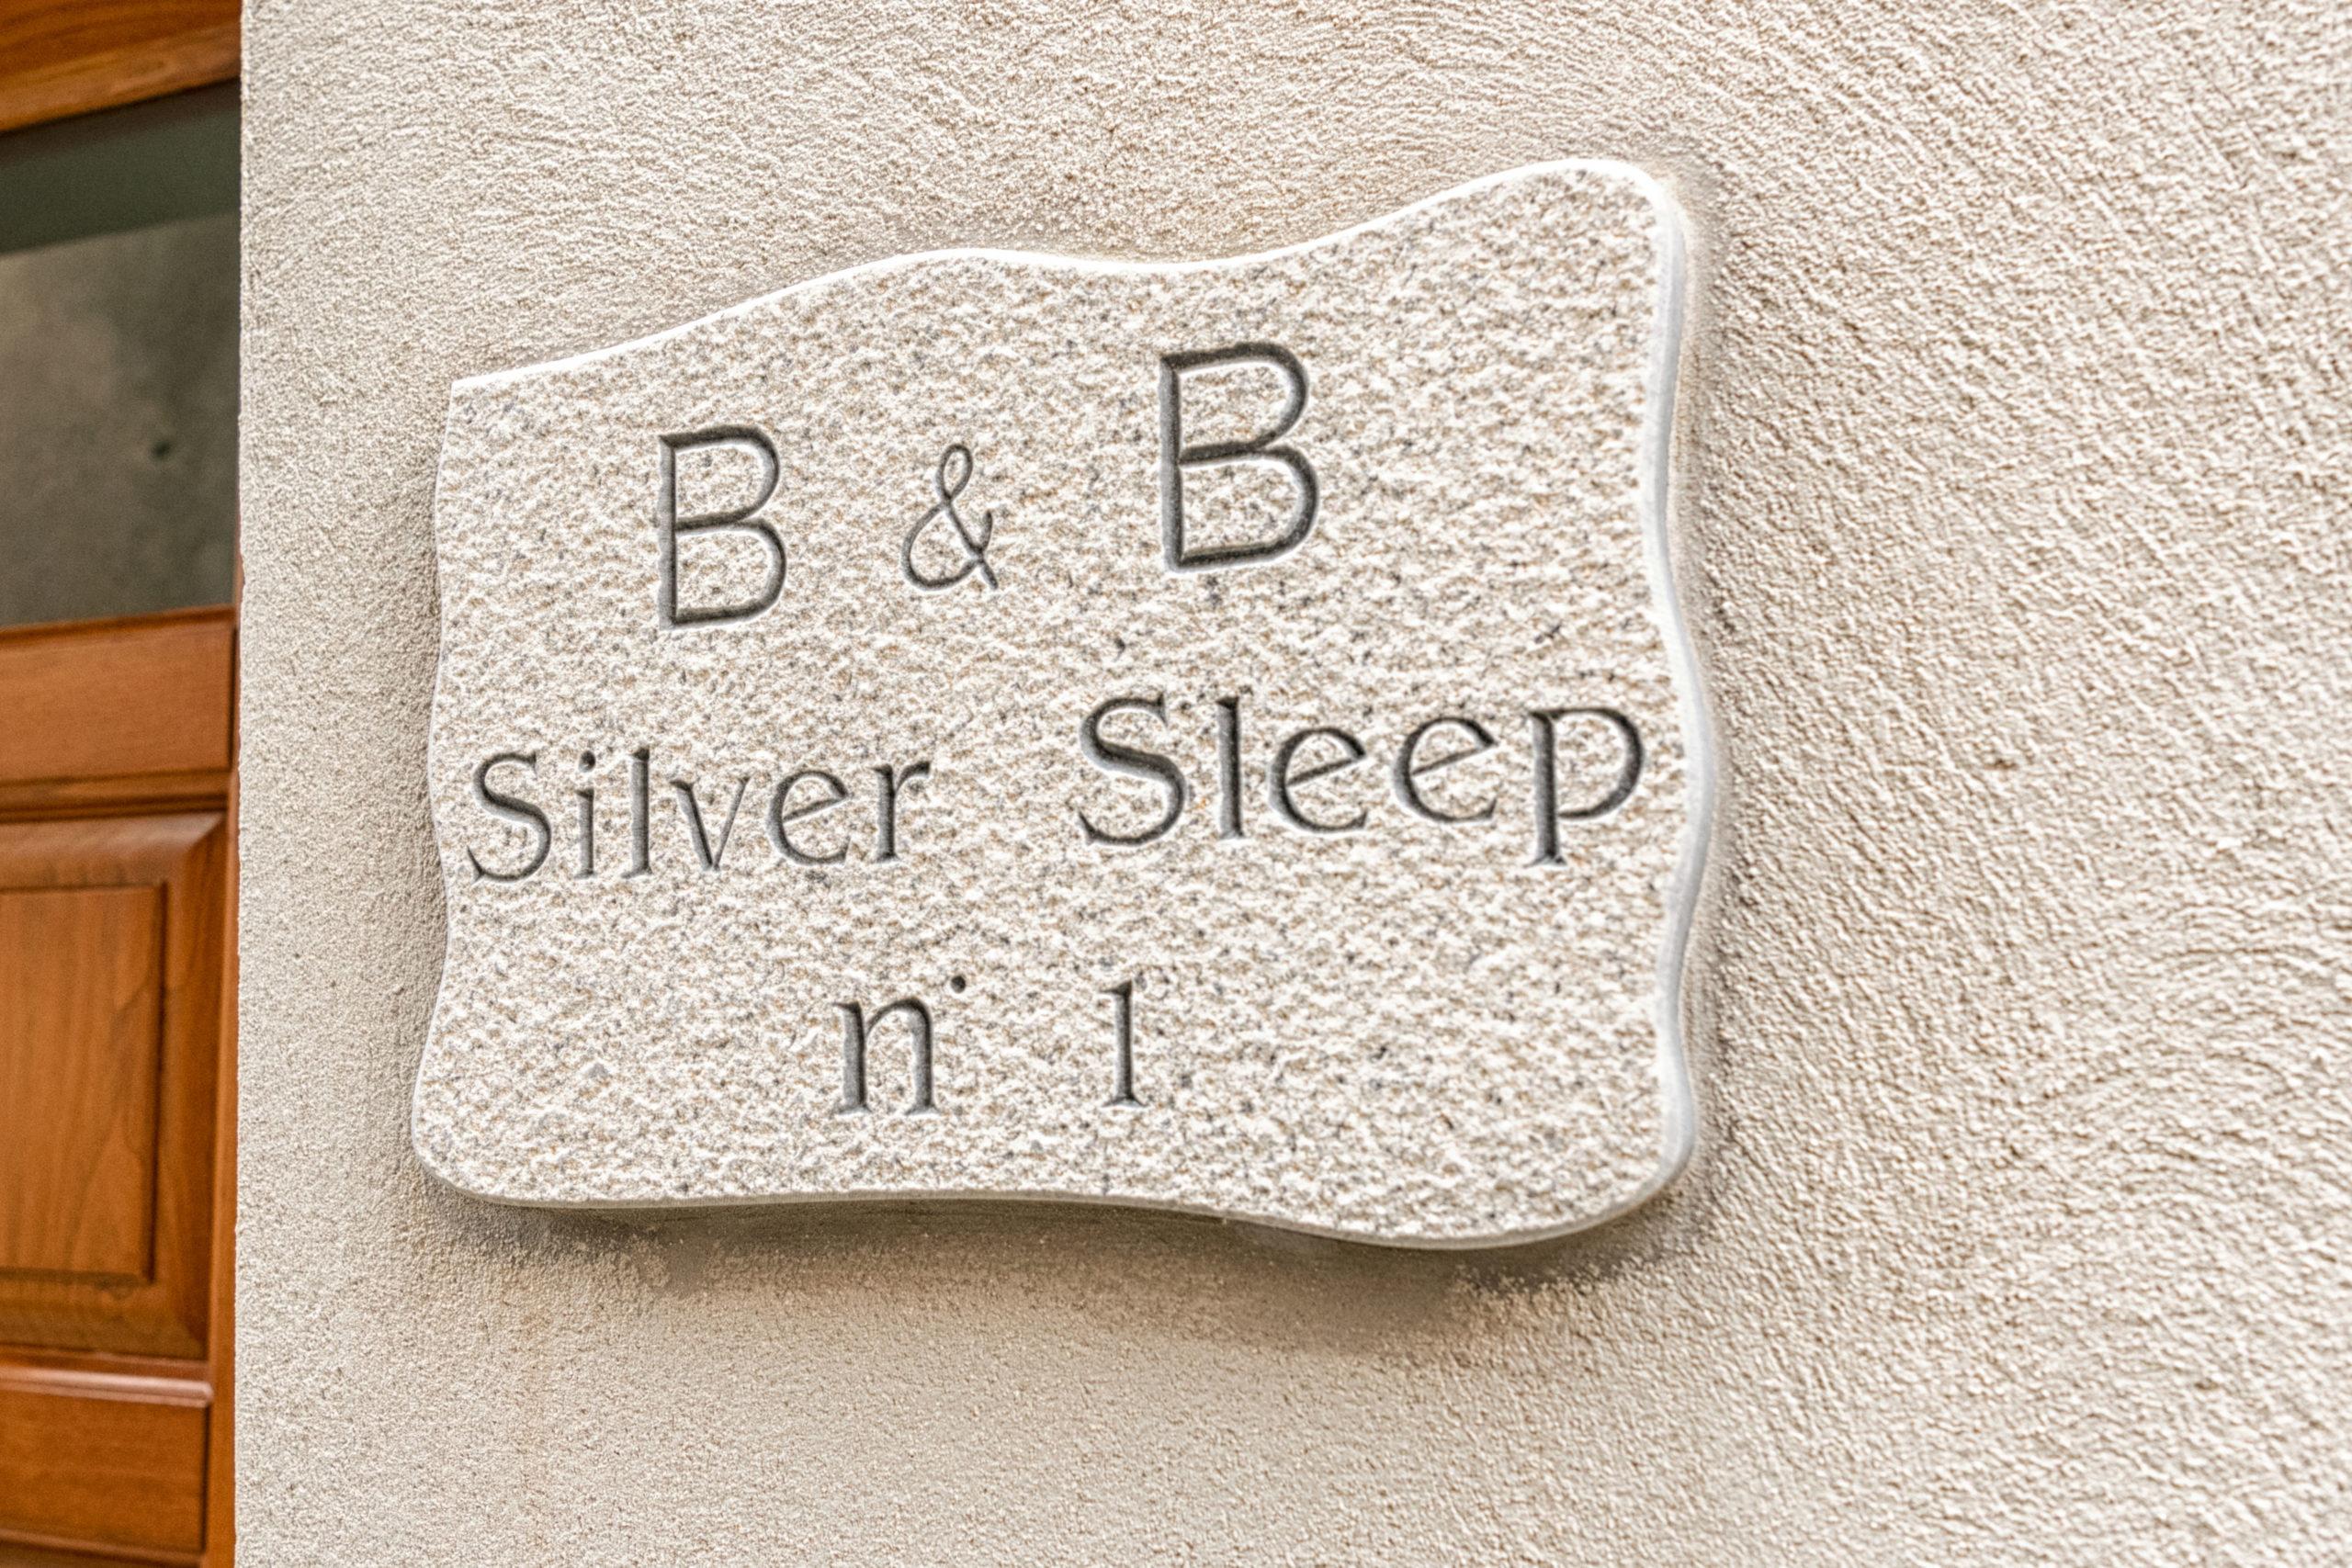 B&B Silver Sleep